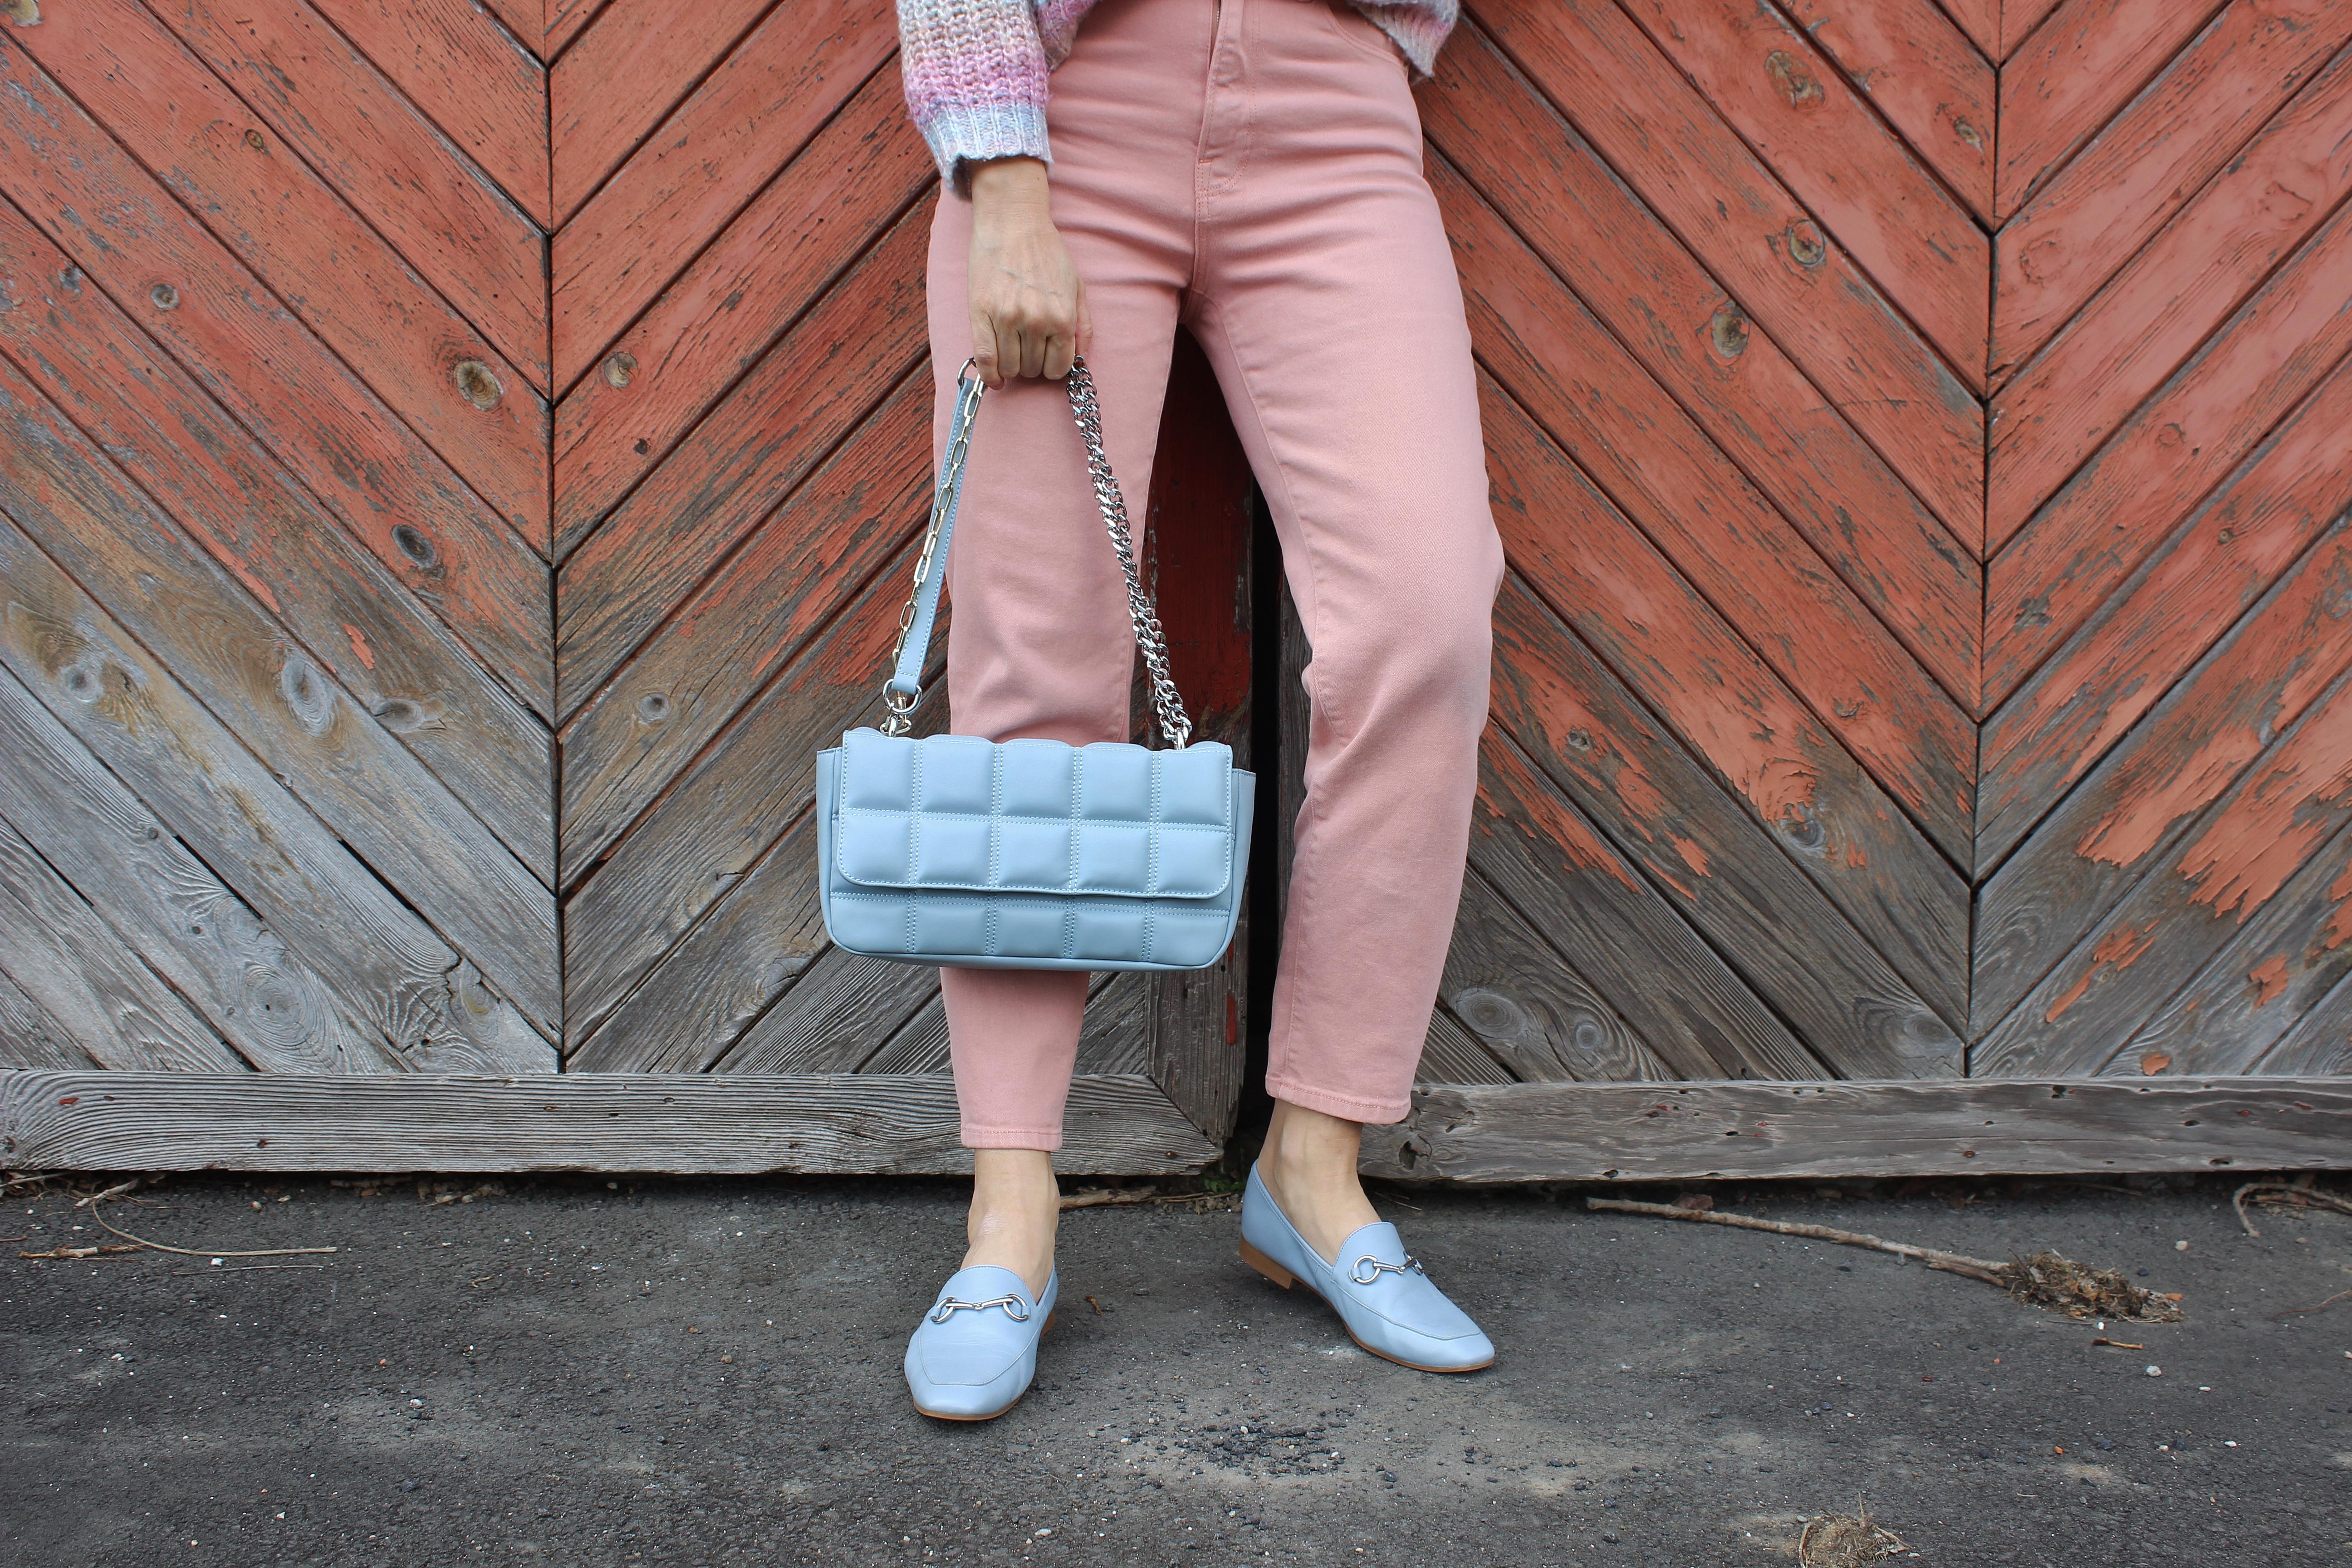 and Bags-GIno Rossi Tasche hellblau-Gino Rossi Halbschuhe Hellblau-Springfashion-Springlooks-Frühlingstrends-Frühlingsmode-carrieslifestyle-Tamara Prutsch